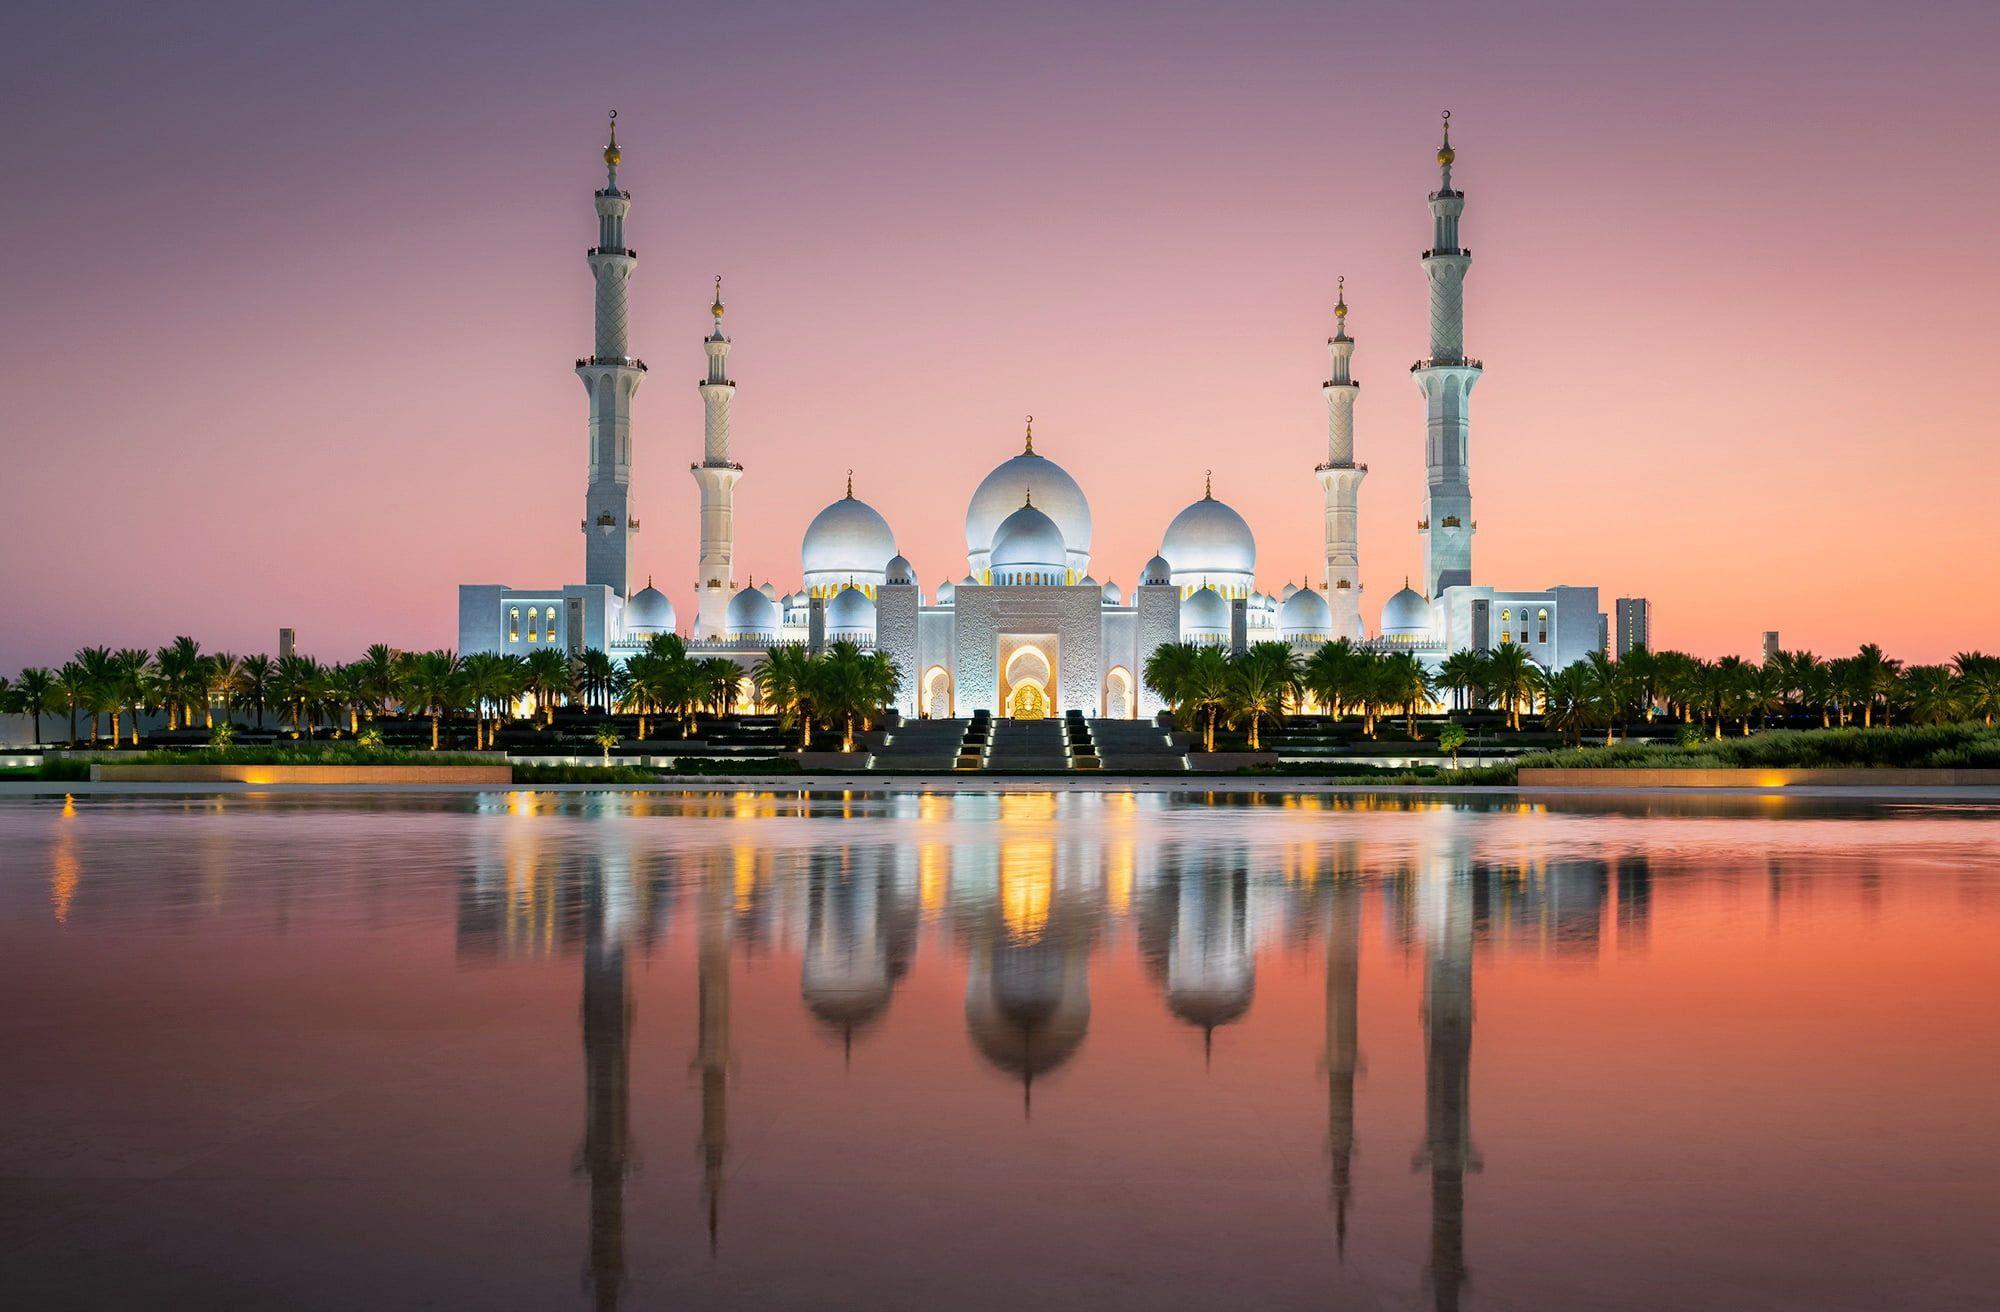 Abu Dhabi Uae Grand Mosque Sheikh Zayed 1080p Wallpaper Hdwallpaper Desktop In 2021 Grand Mosque Sheikh Zayed Grand Mosque Abu Dhabi